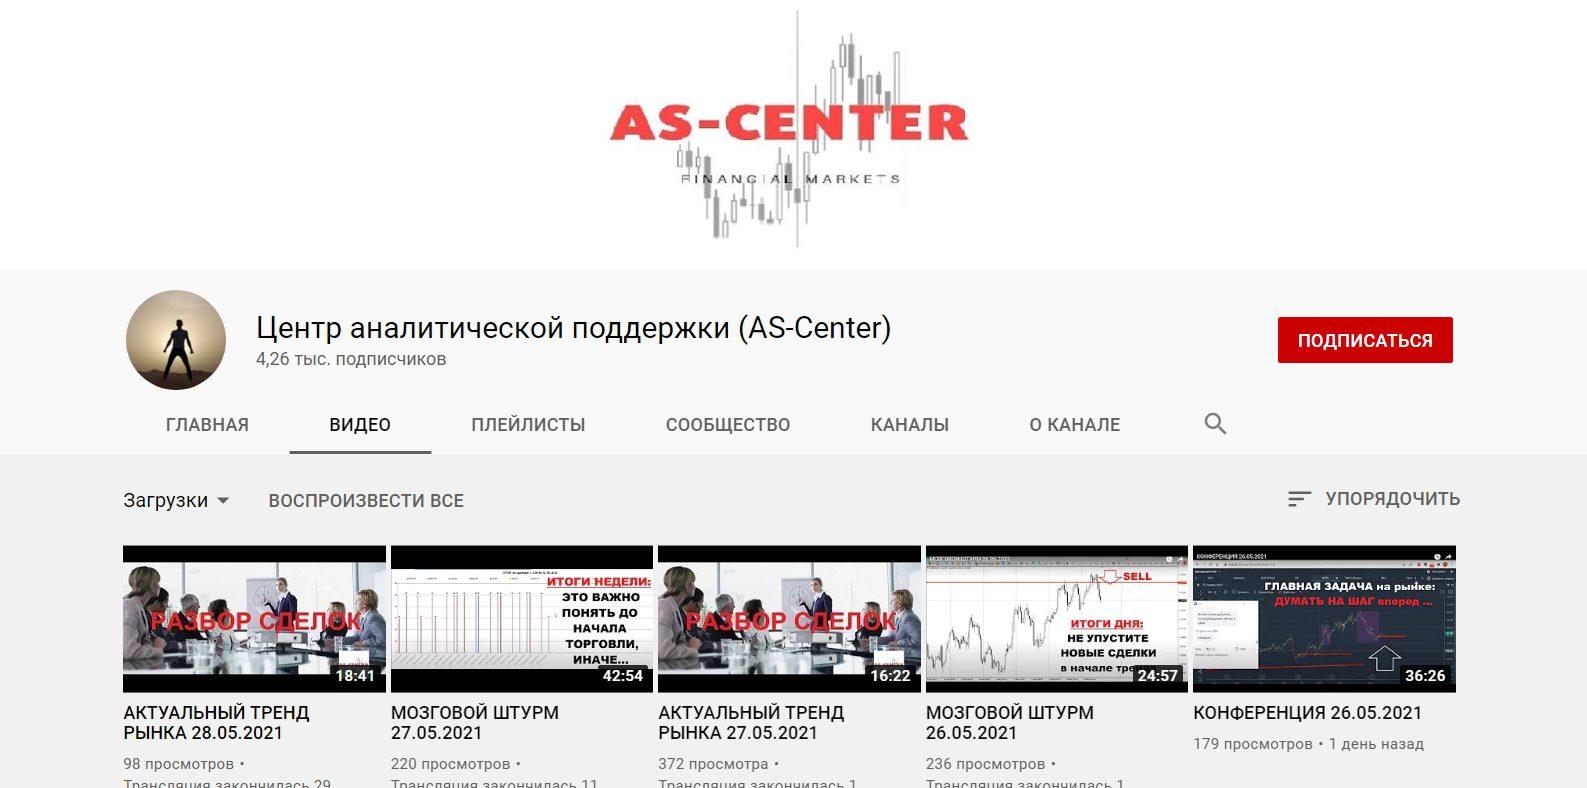 Ютуб-канал проекта AS-Center